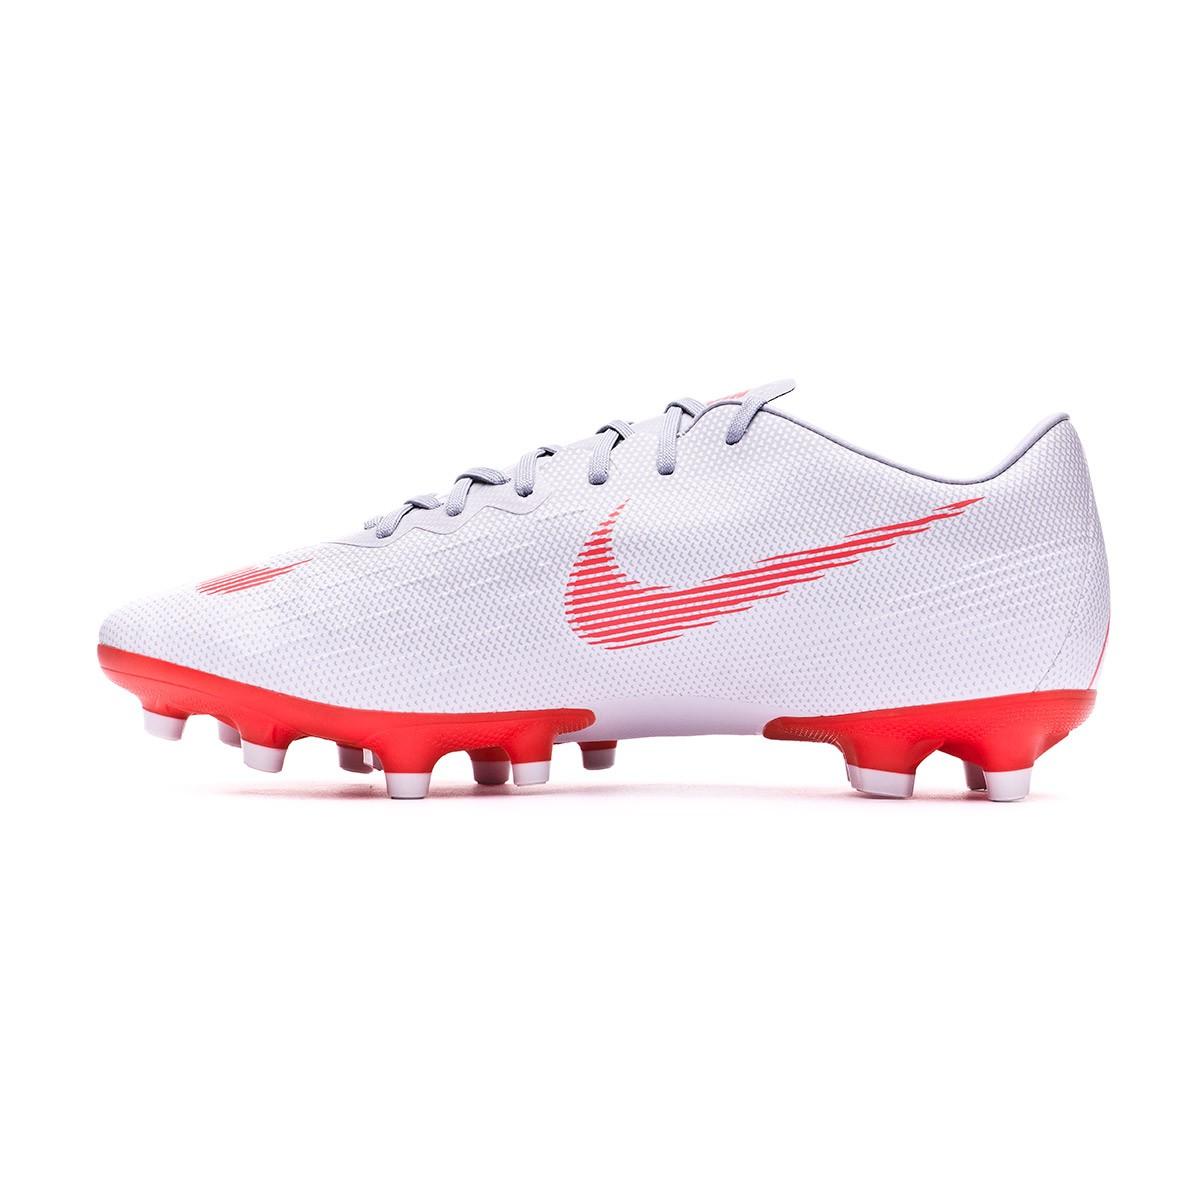 ea173b7b6 Boot Nike Mercurial Vapor XII Pro AG-Pro Wolf grey-Light crimson-Pure  platinum - Leaked soccer